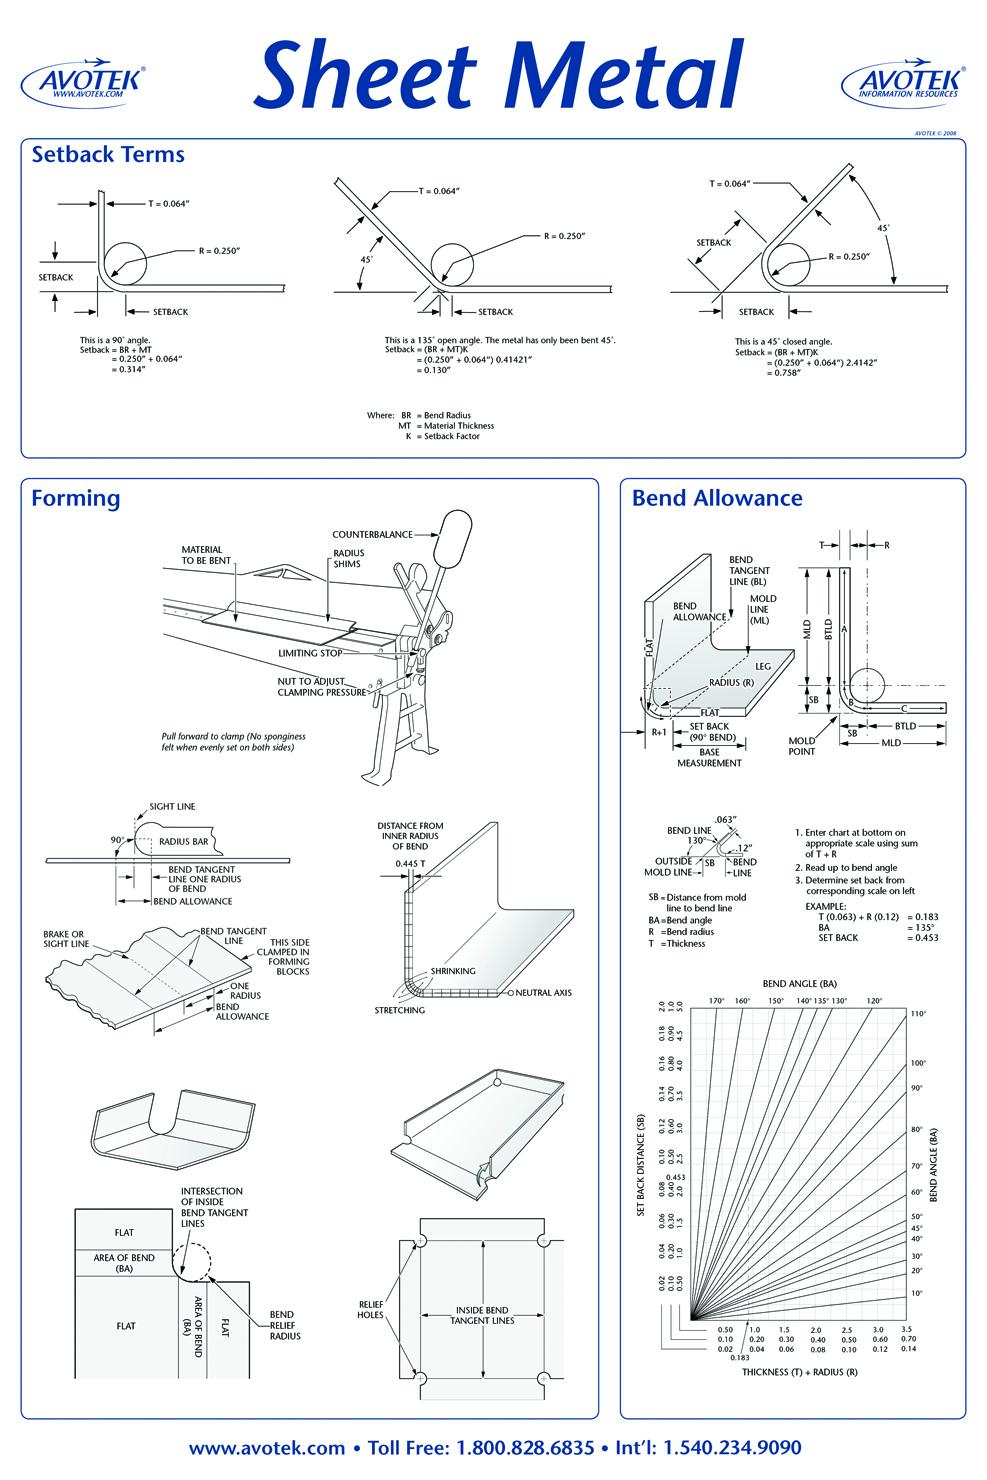 Classroom Poster - Sheet Metal